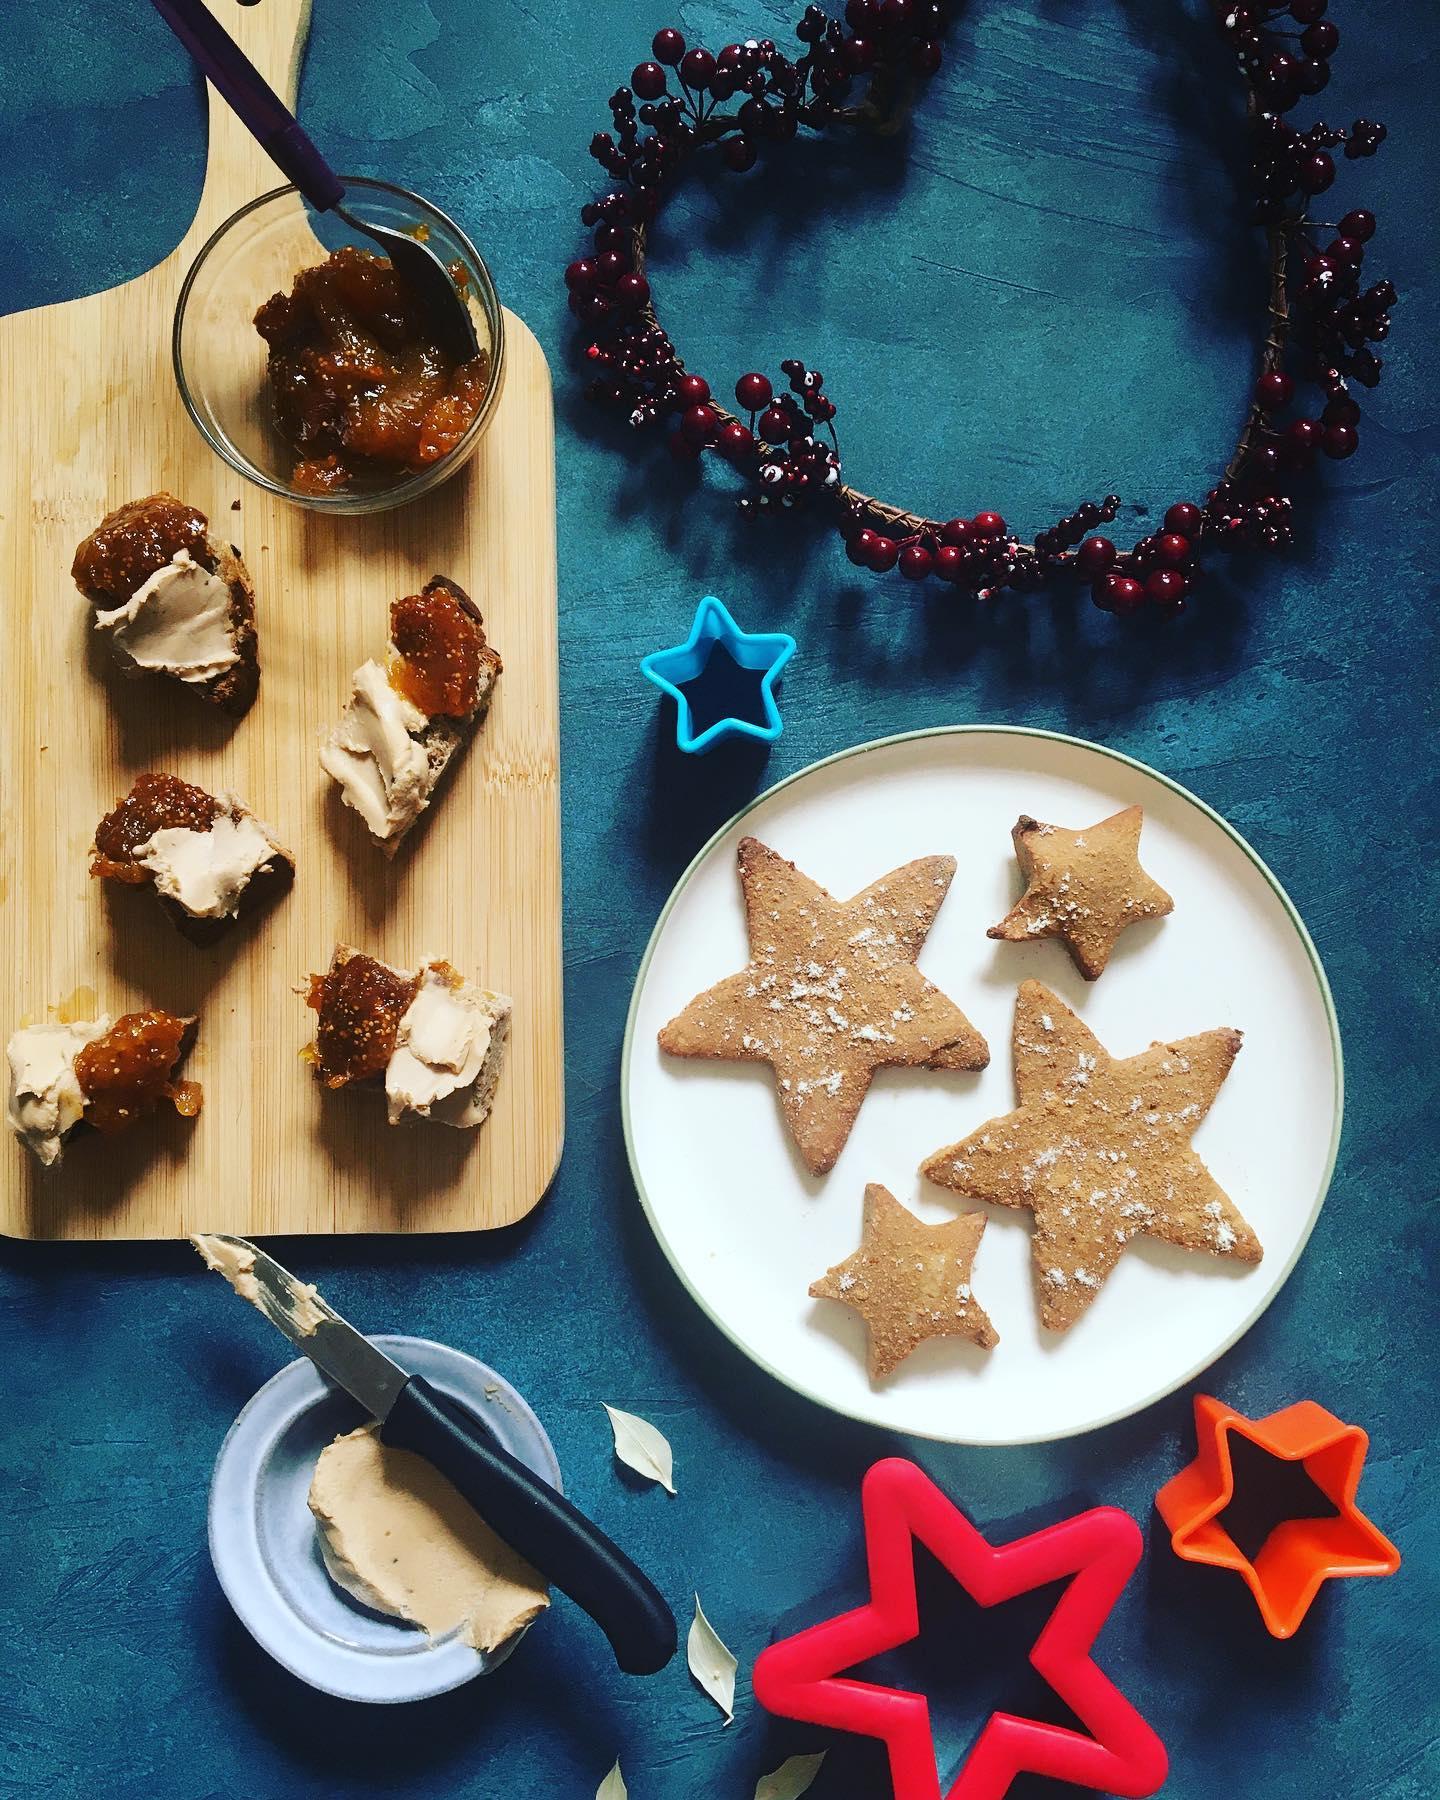 Christmas cookies and Foie gras 'faux gras'